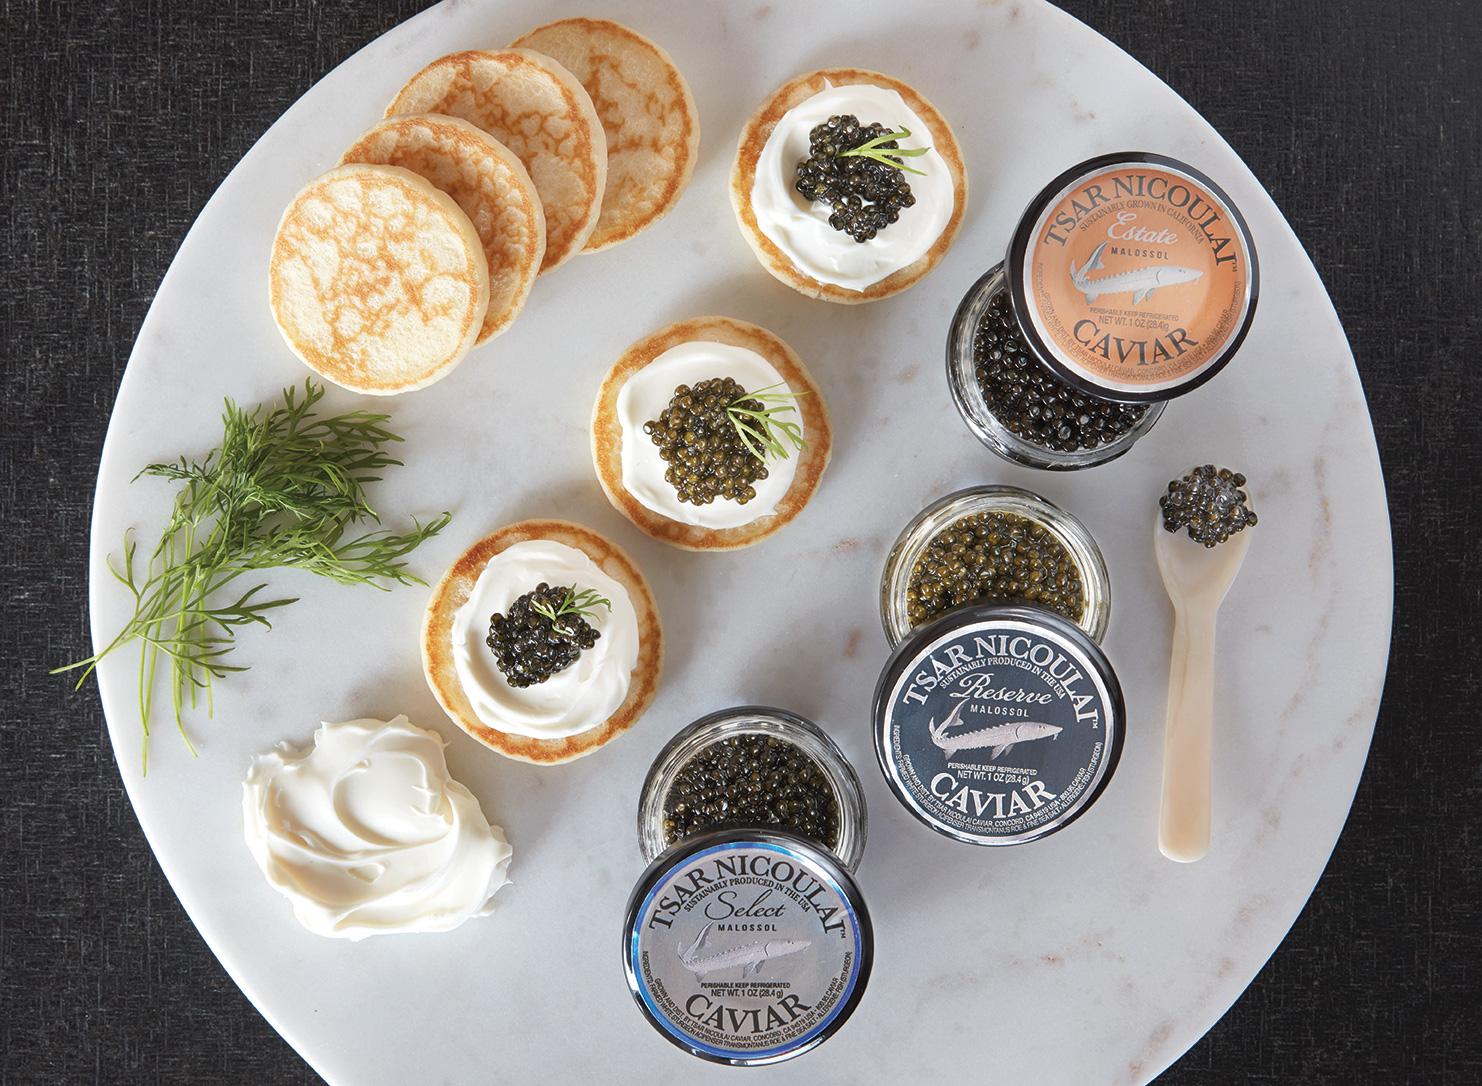 Tsar Nicolai Caviar